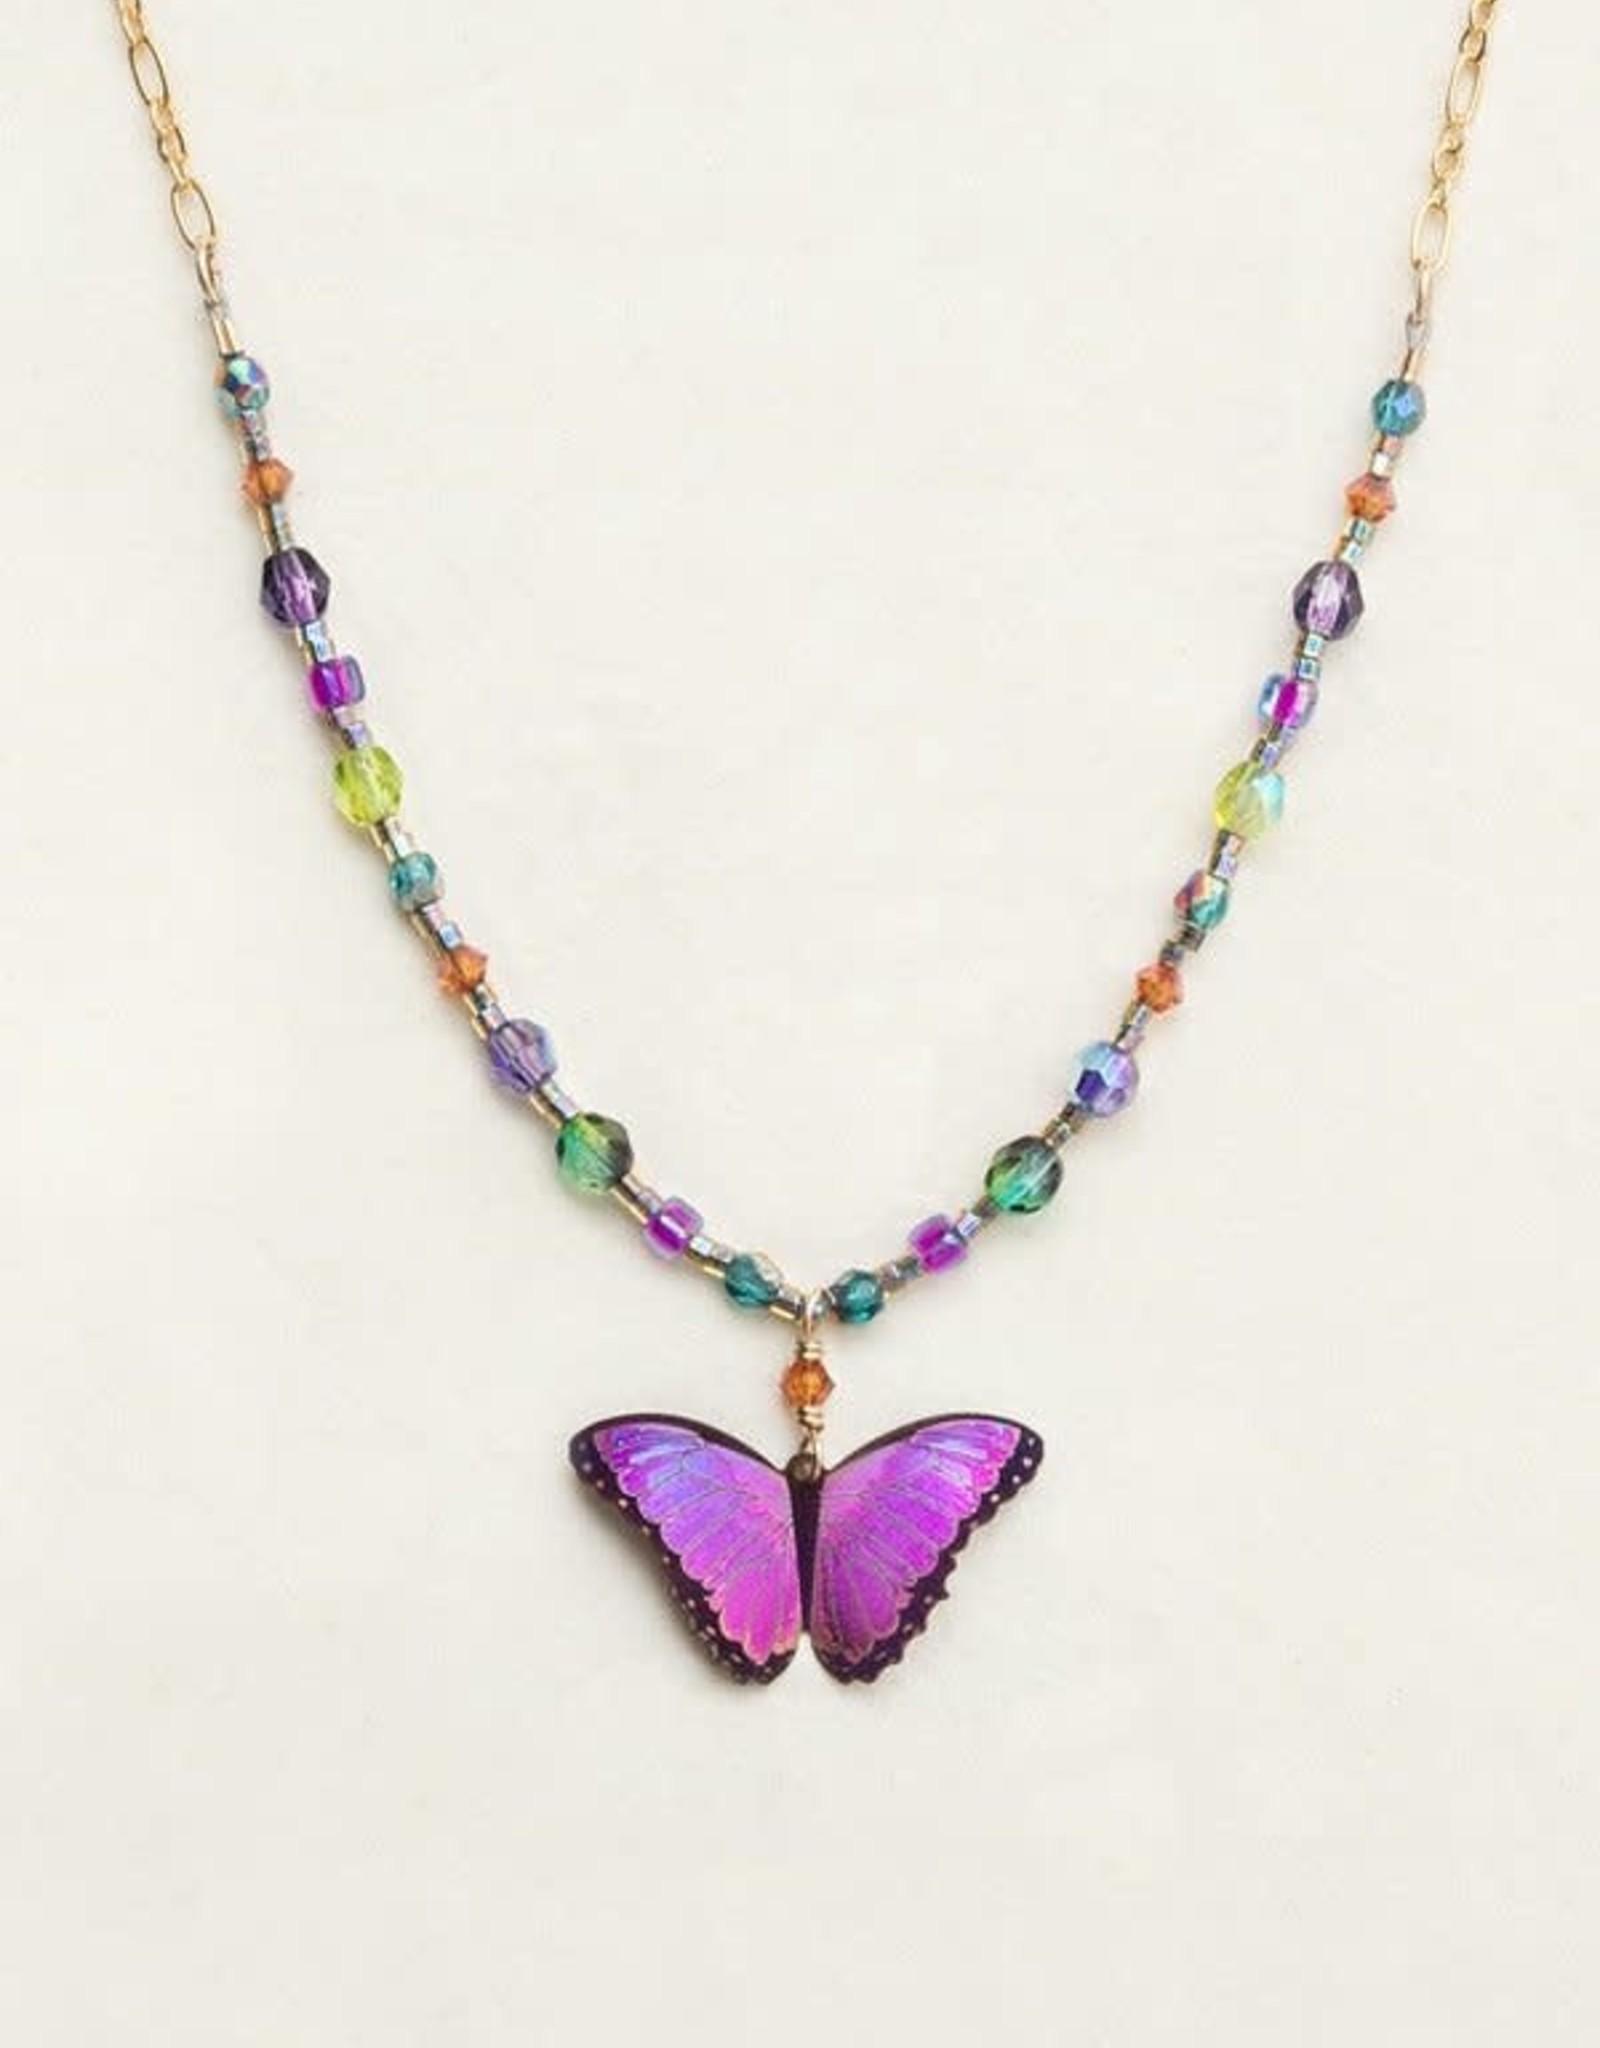 Holly Yashi Ultra Violet Bella Butterfly Beaded Necklace